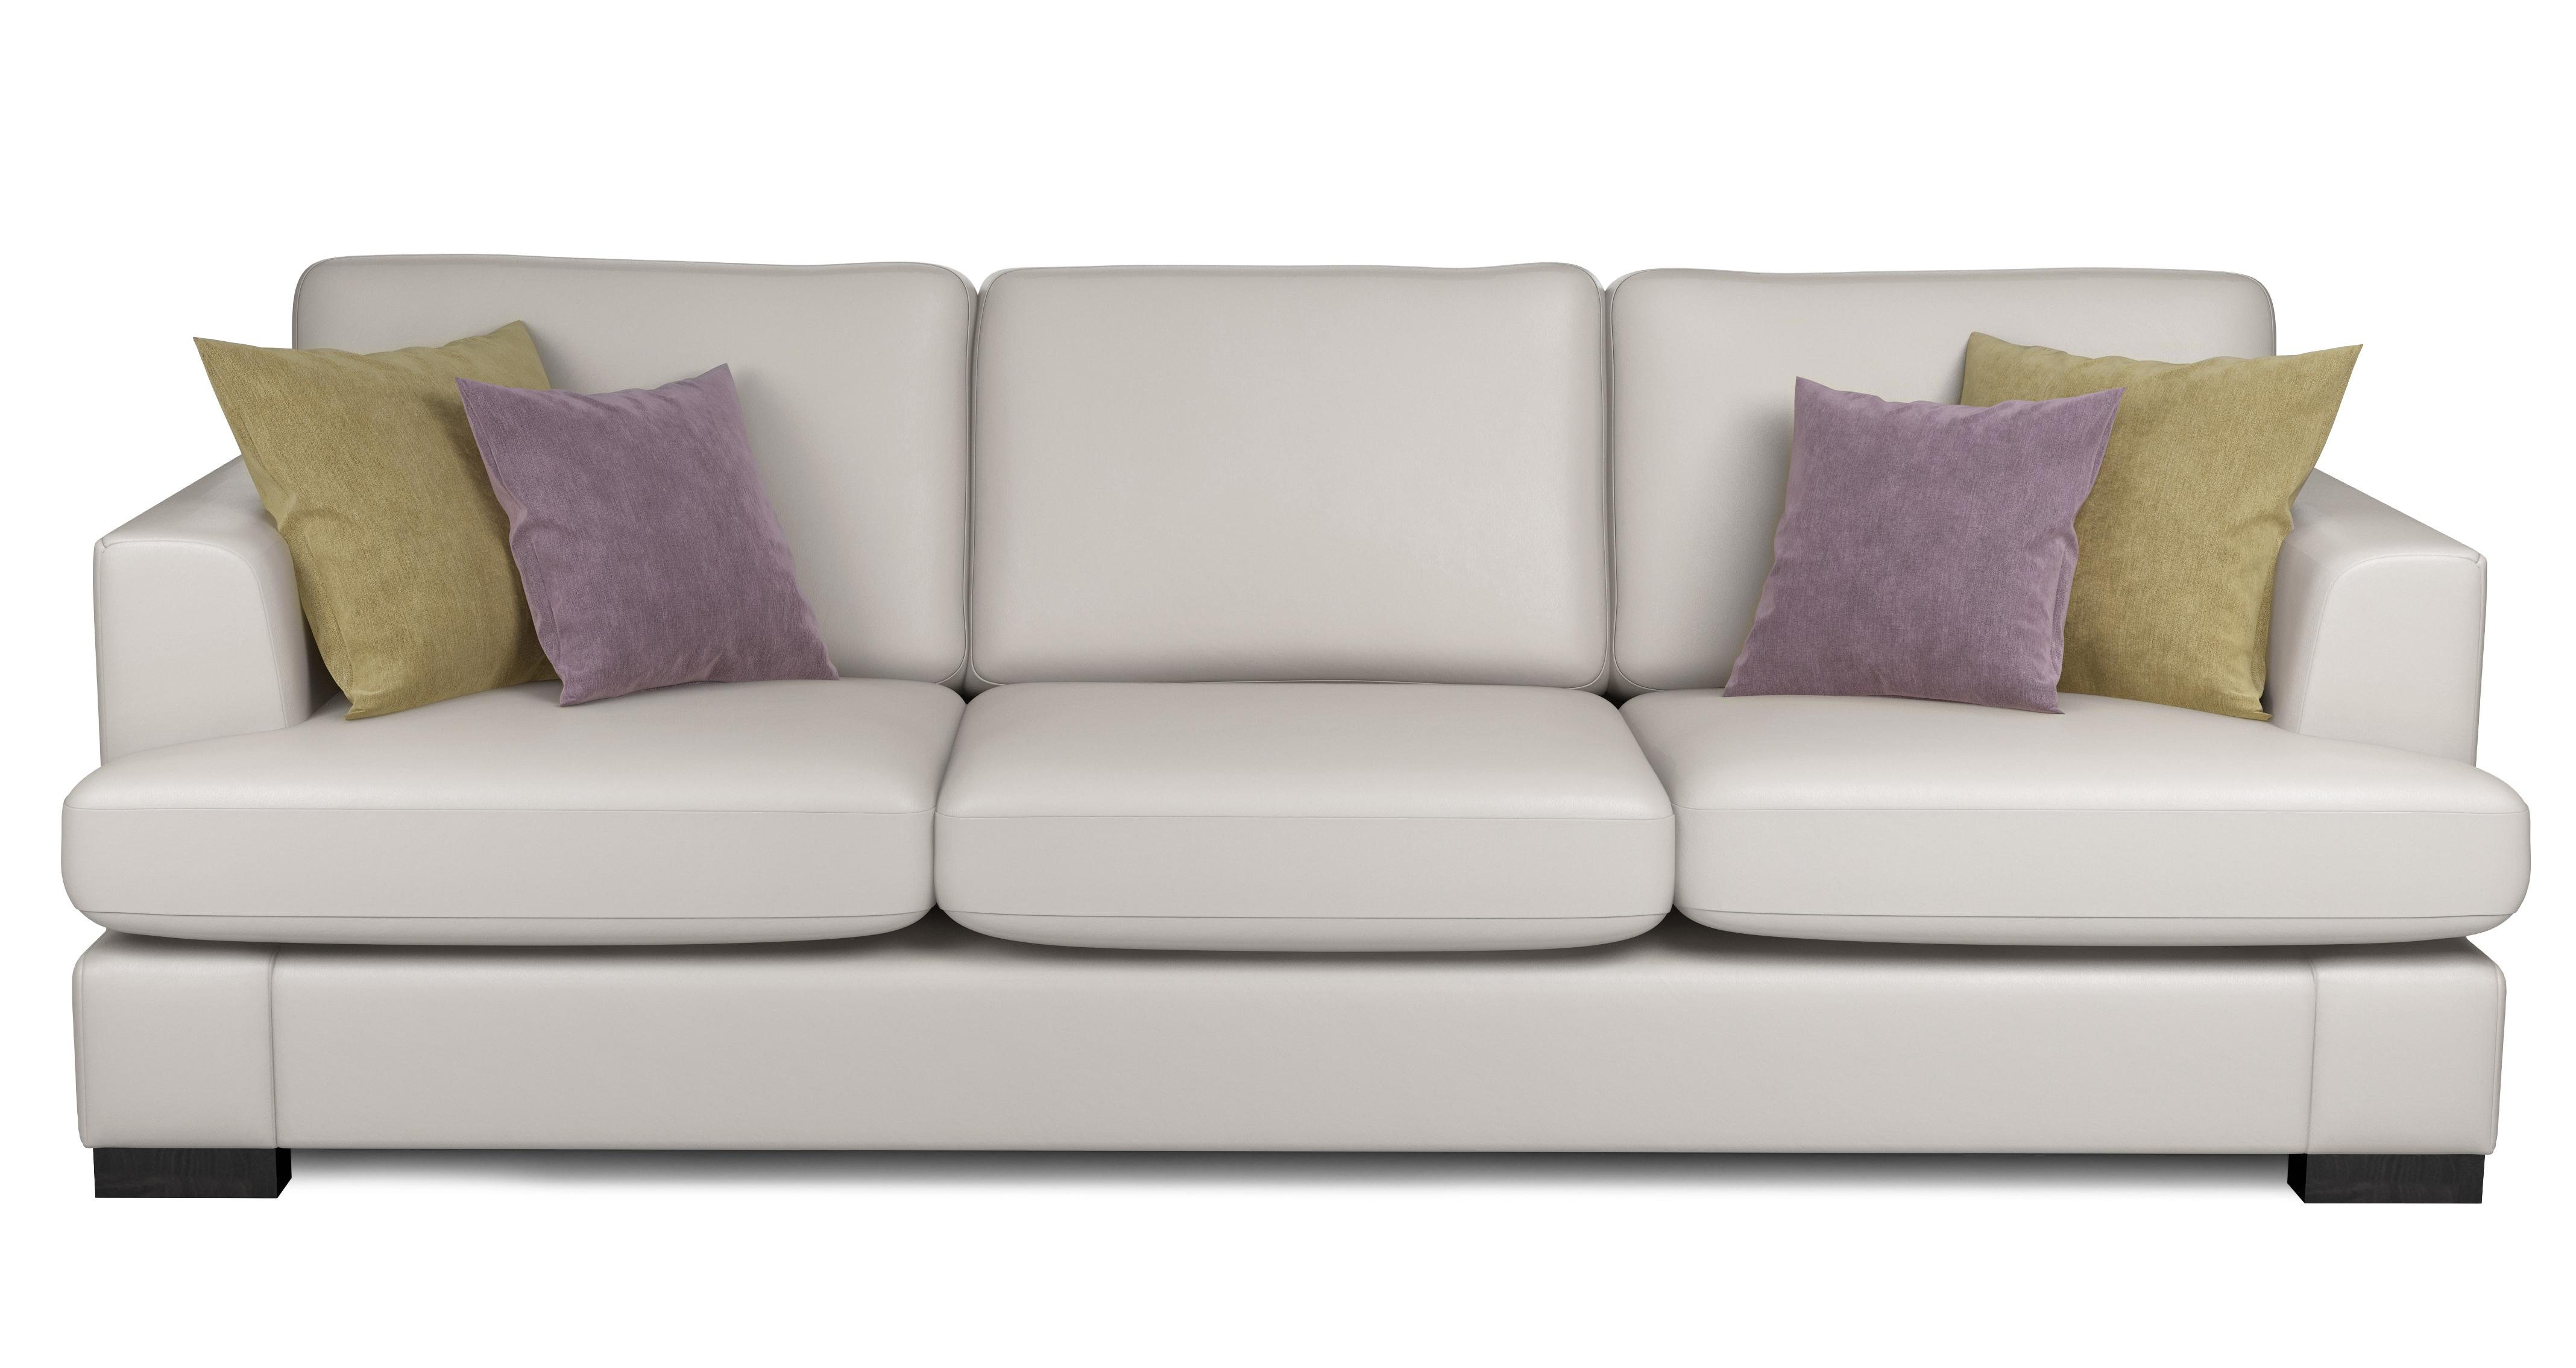 freya leather 4 seater sofa beau dfs. Black Bedroom Furniture Sets. Home Design Ideas